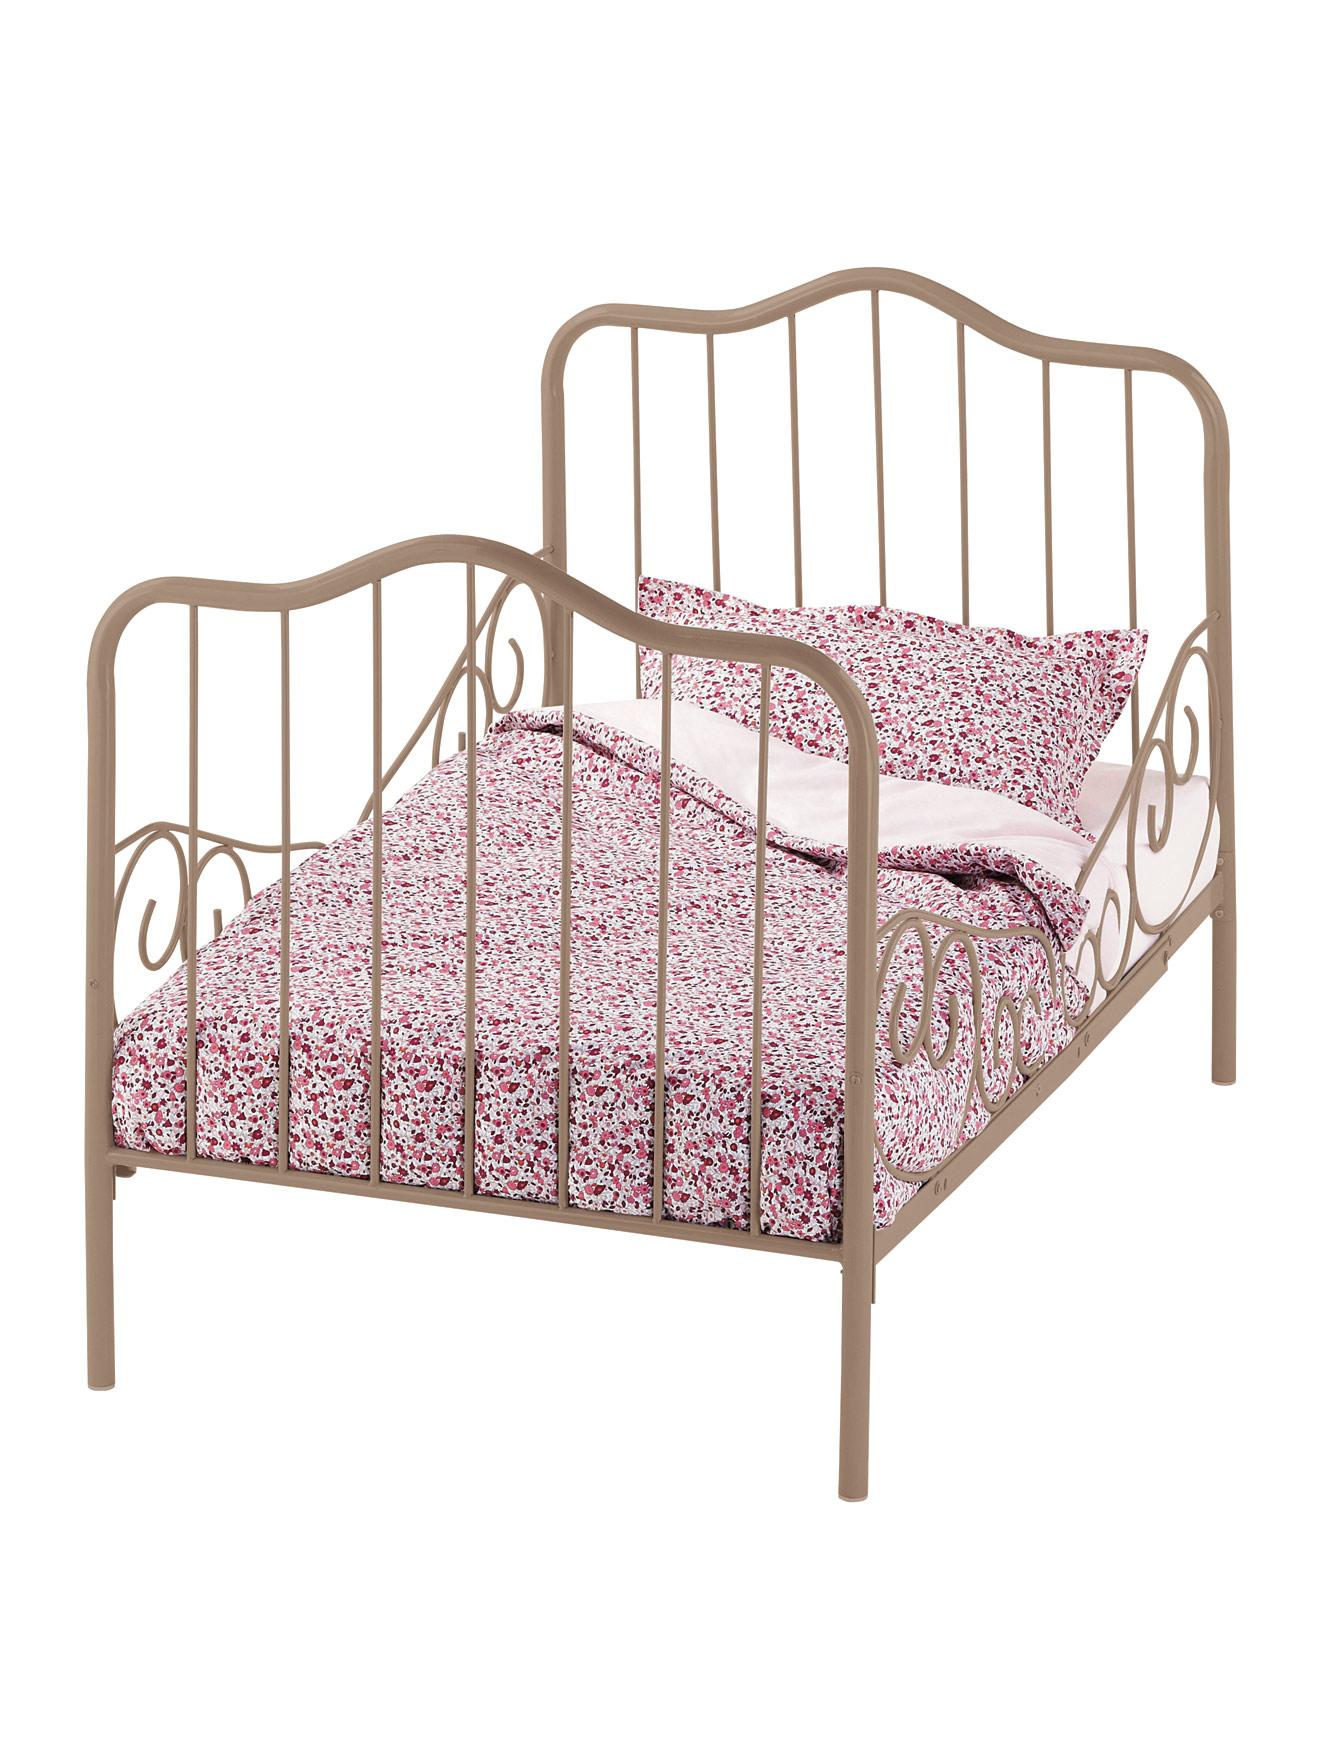 lit junior ikea neuf. Black Bedroom Furniture Sets. Home Design Ideas